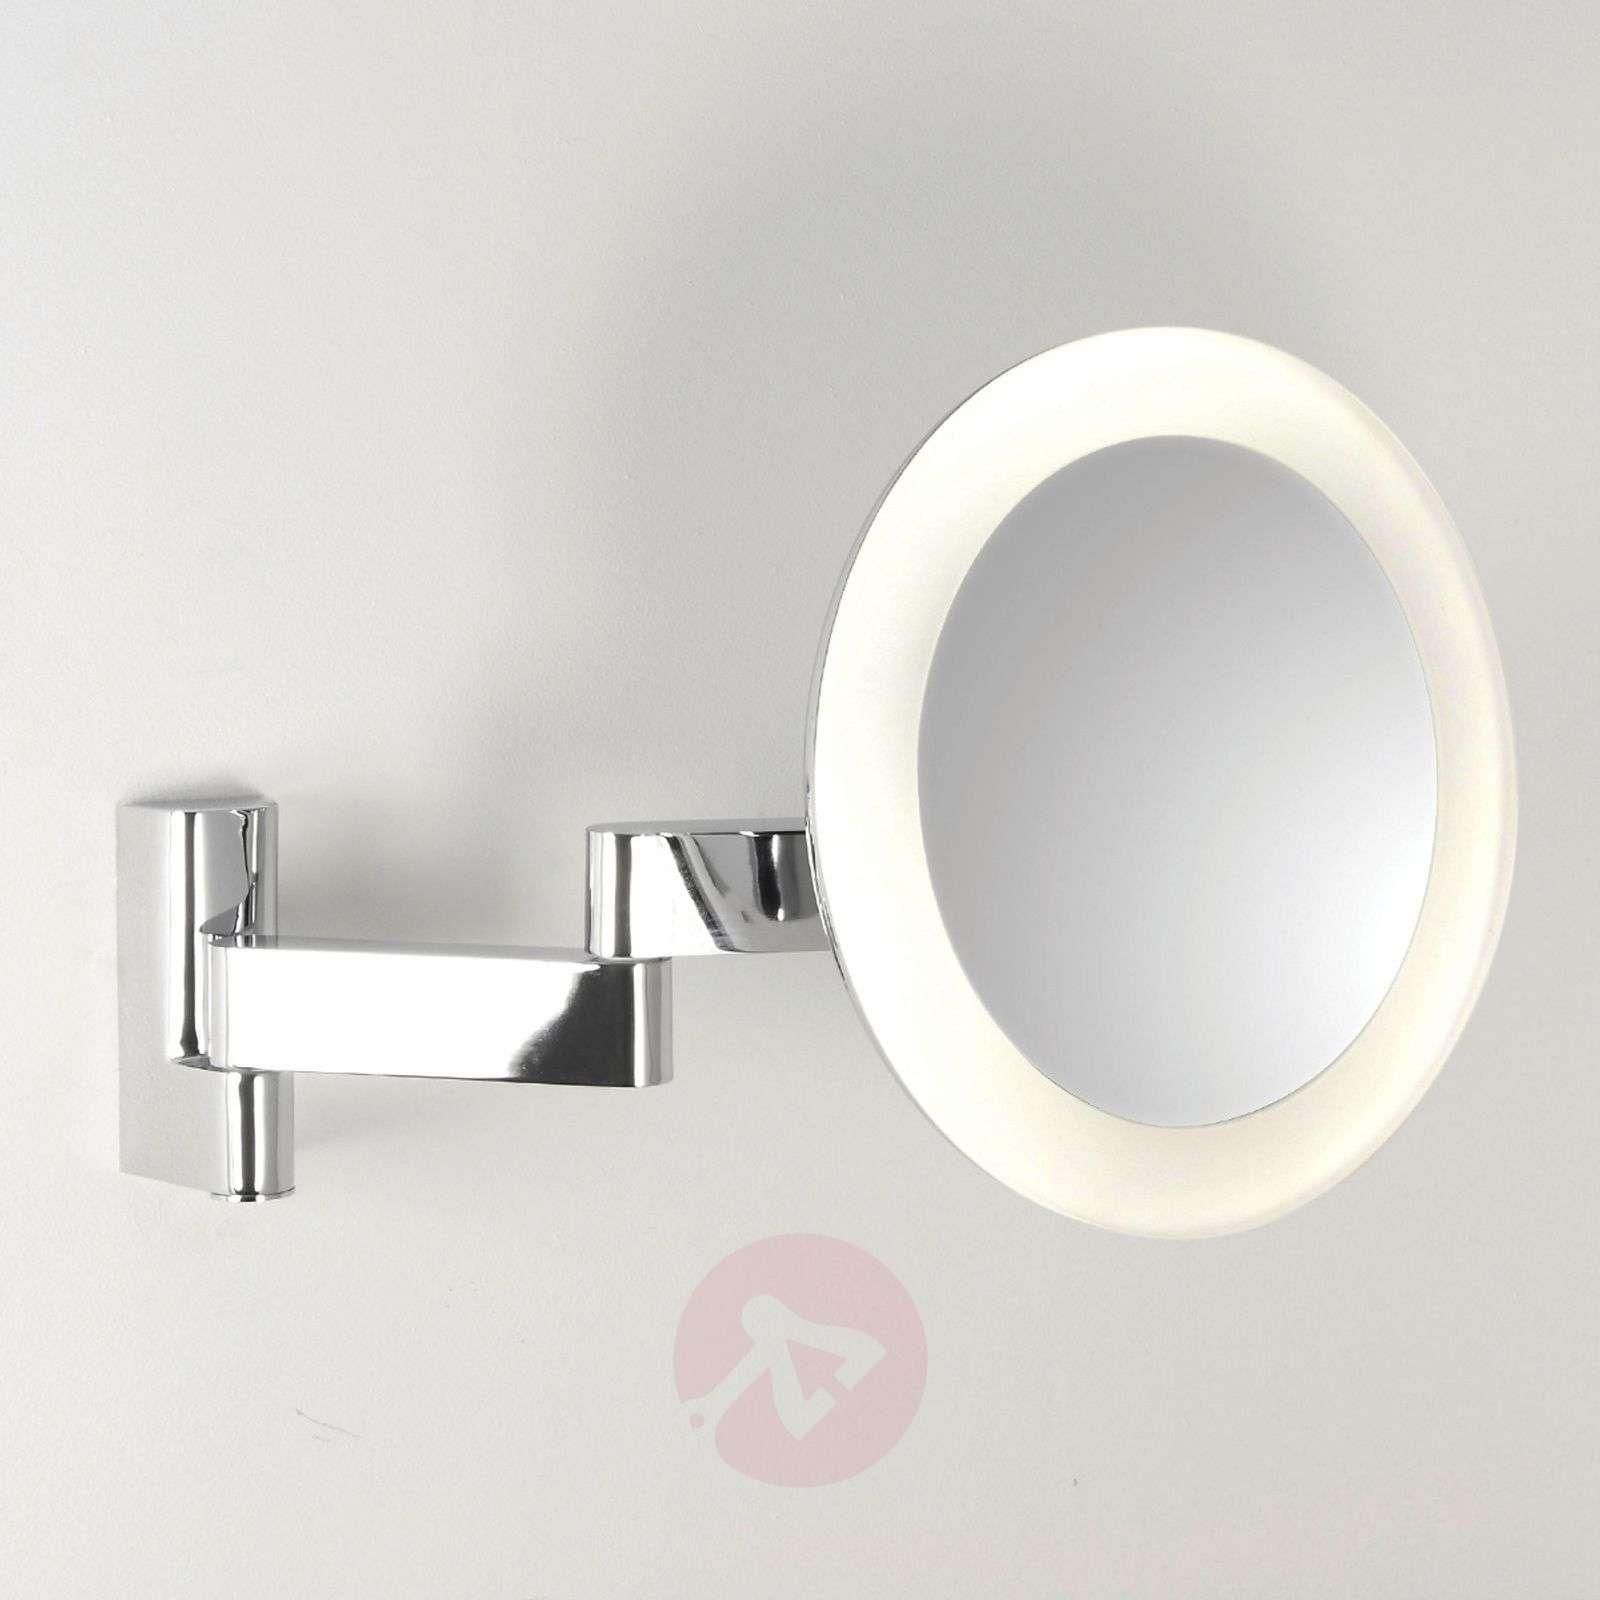 Meikkipeili Niimi Round LED-valaistuksella-1020021-02